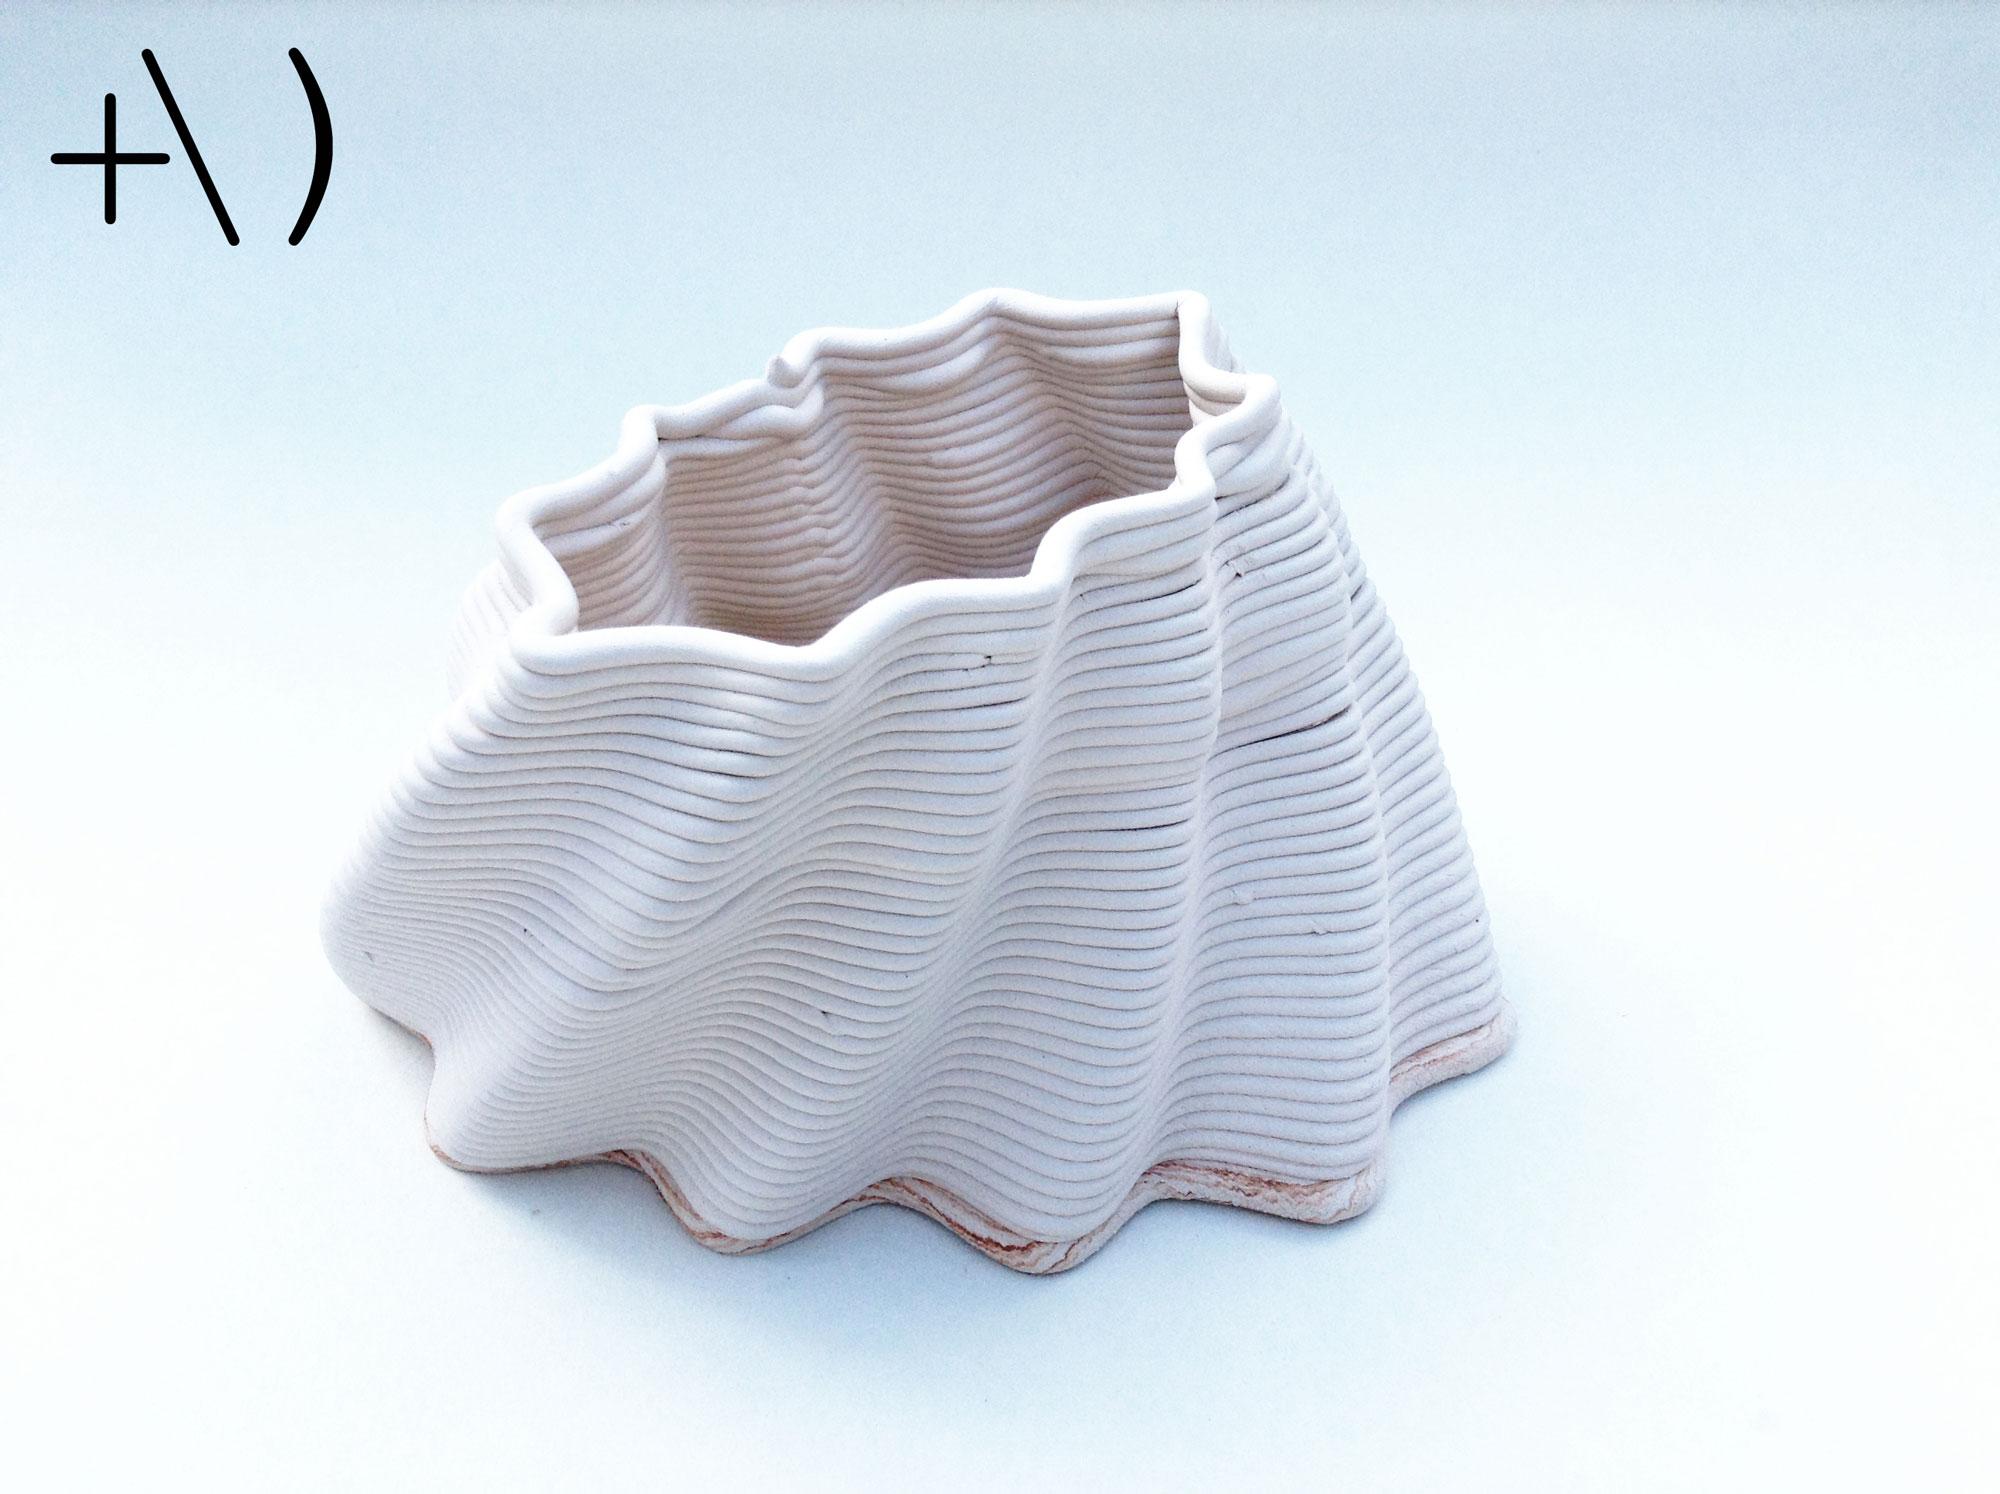 computational clay design torsione